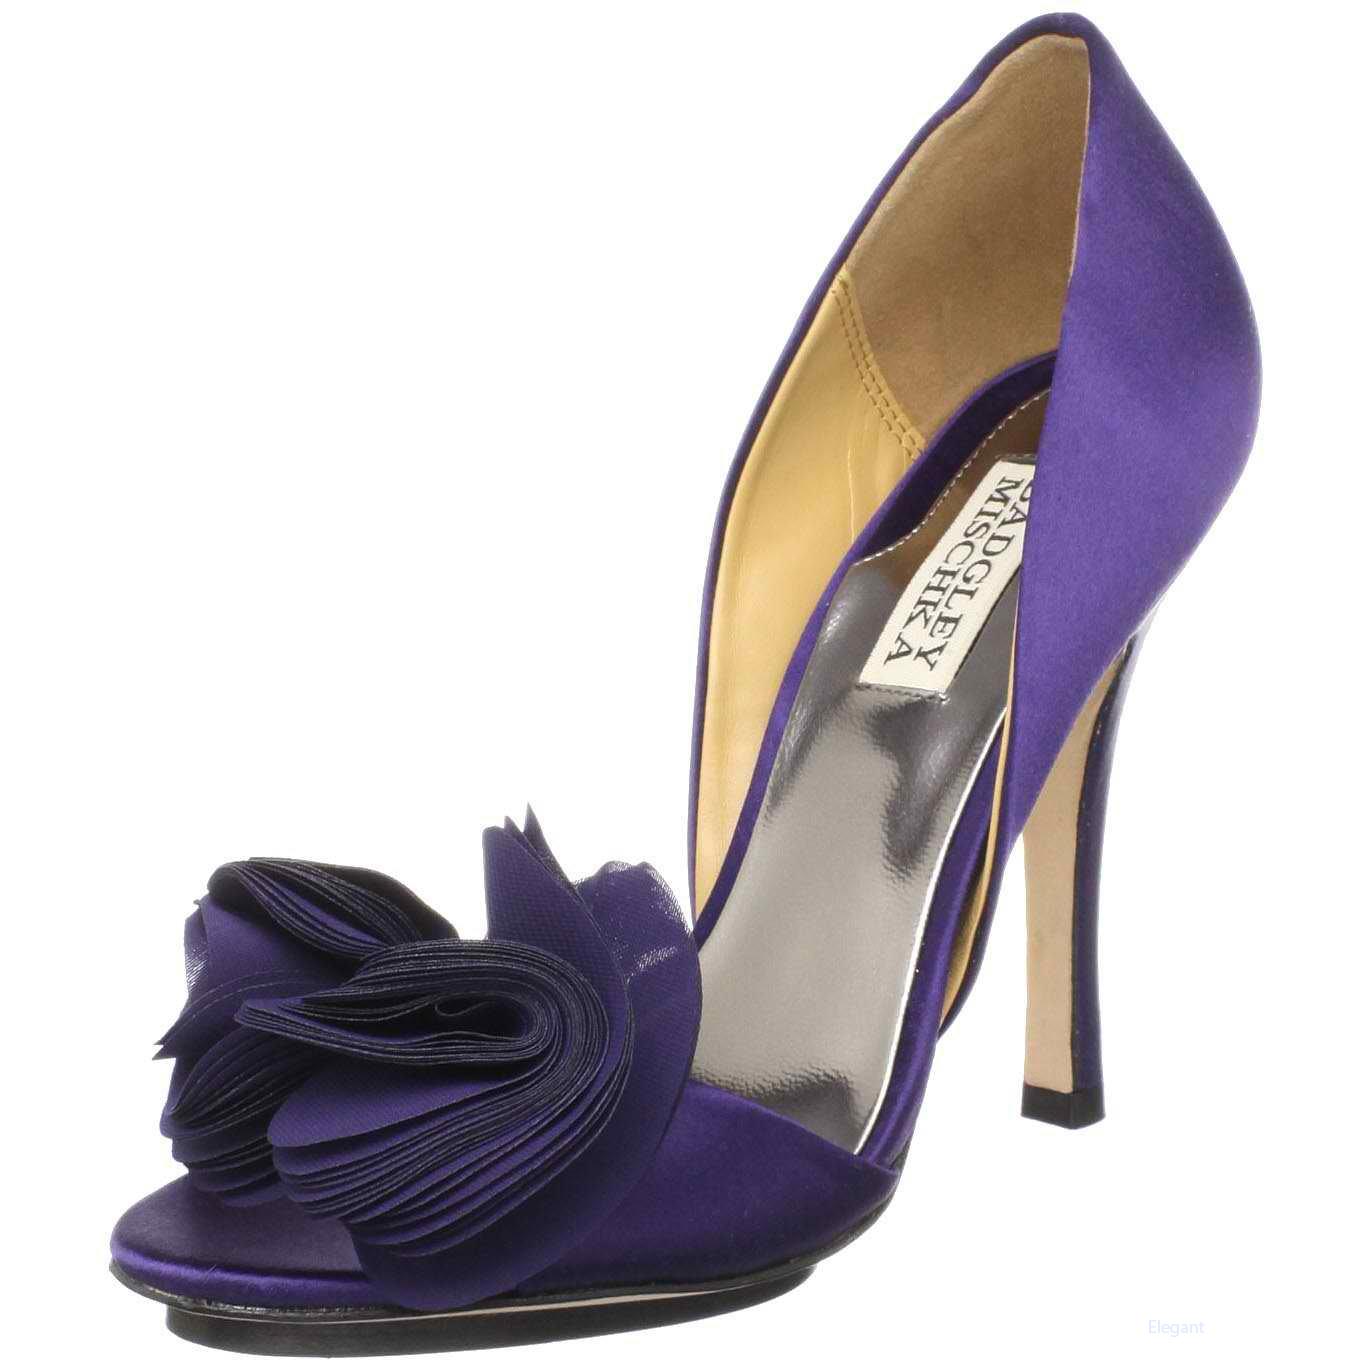 All Fun 143 Purple Bridal Shoes